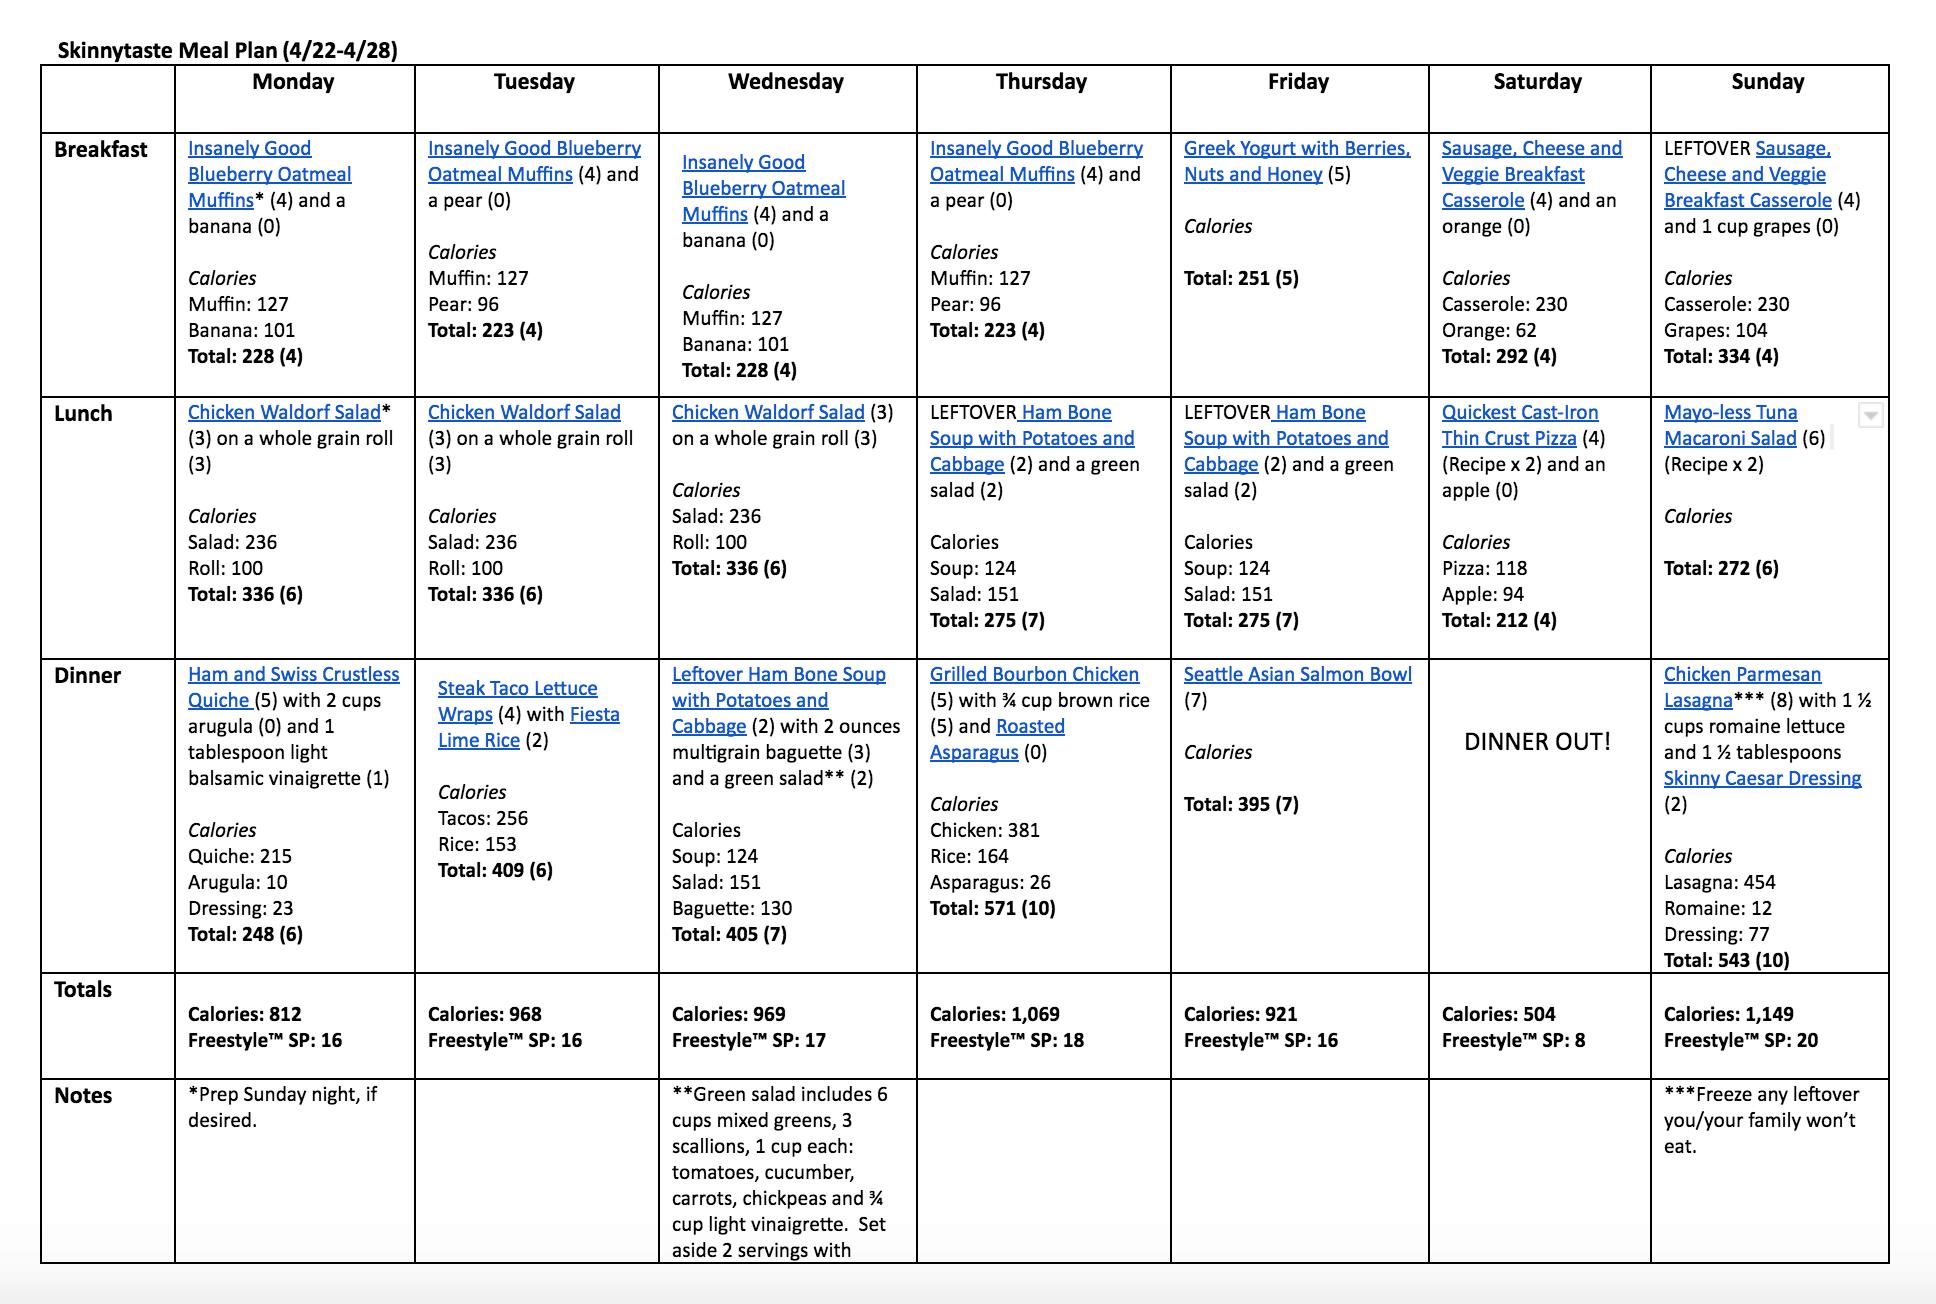 Skinnytaste Meal Plan (April 22-April 28) - Skinnytaste